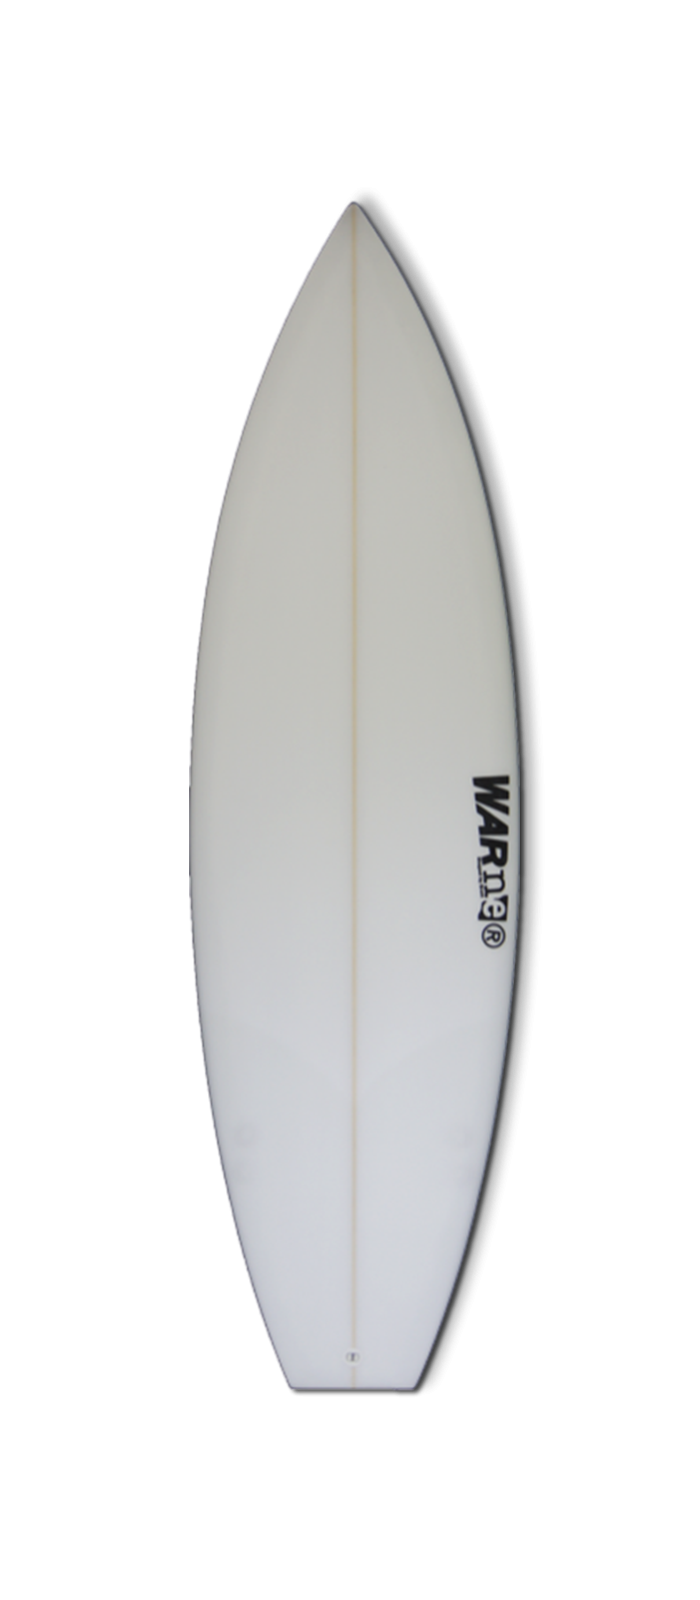 BANDIT surfboard model bottom